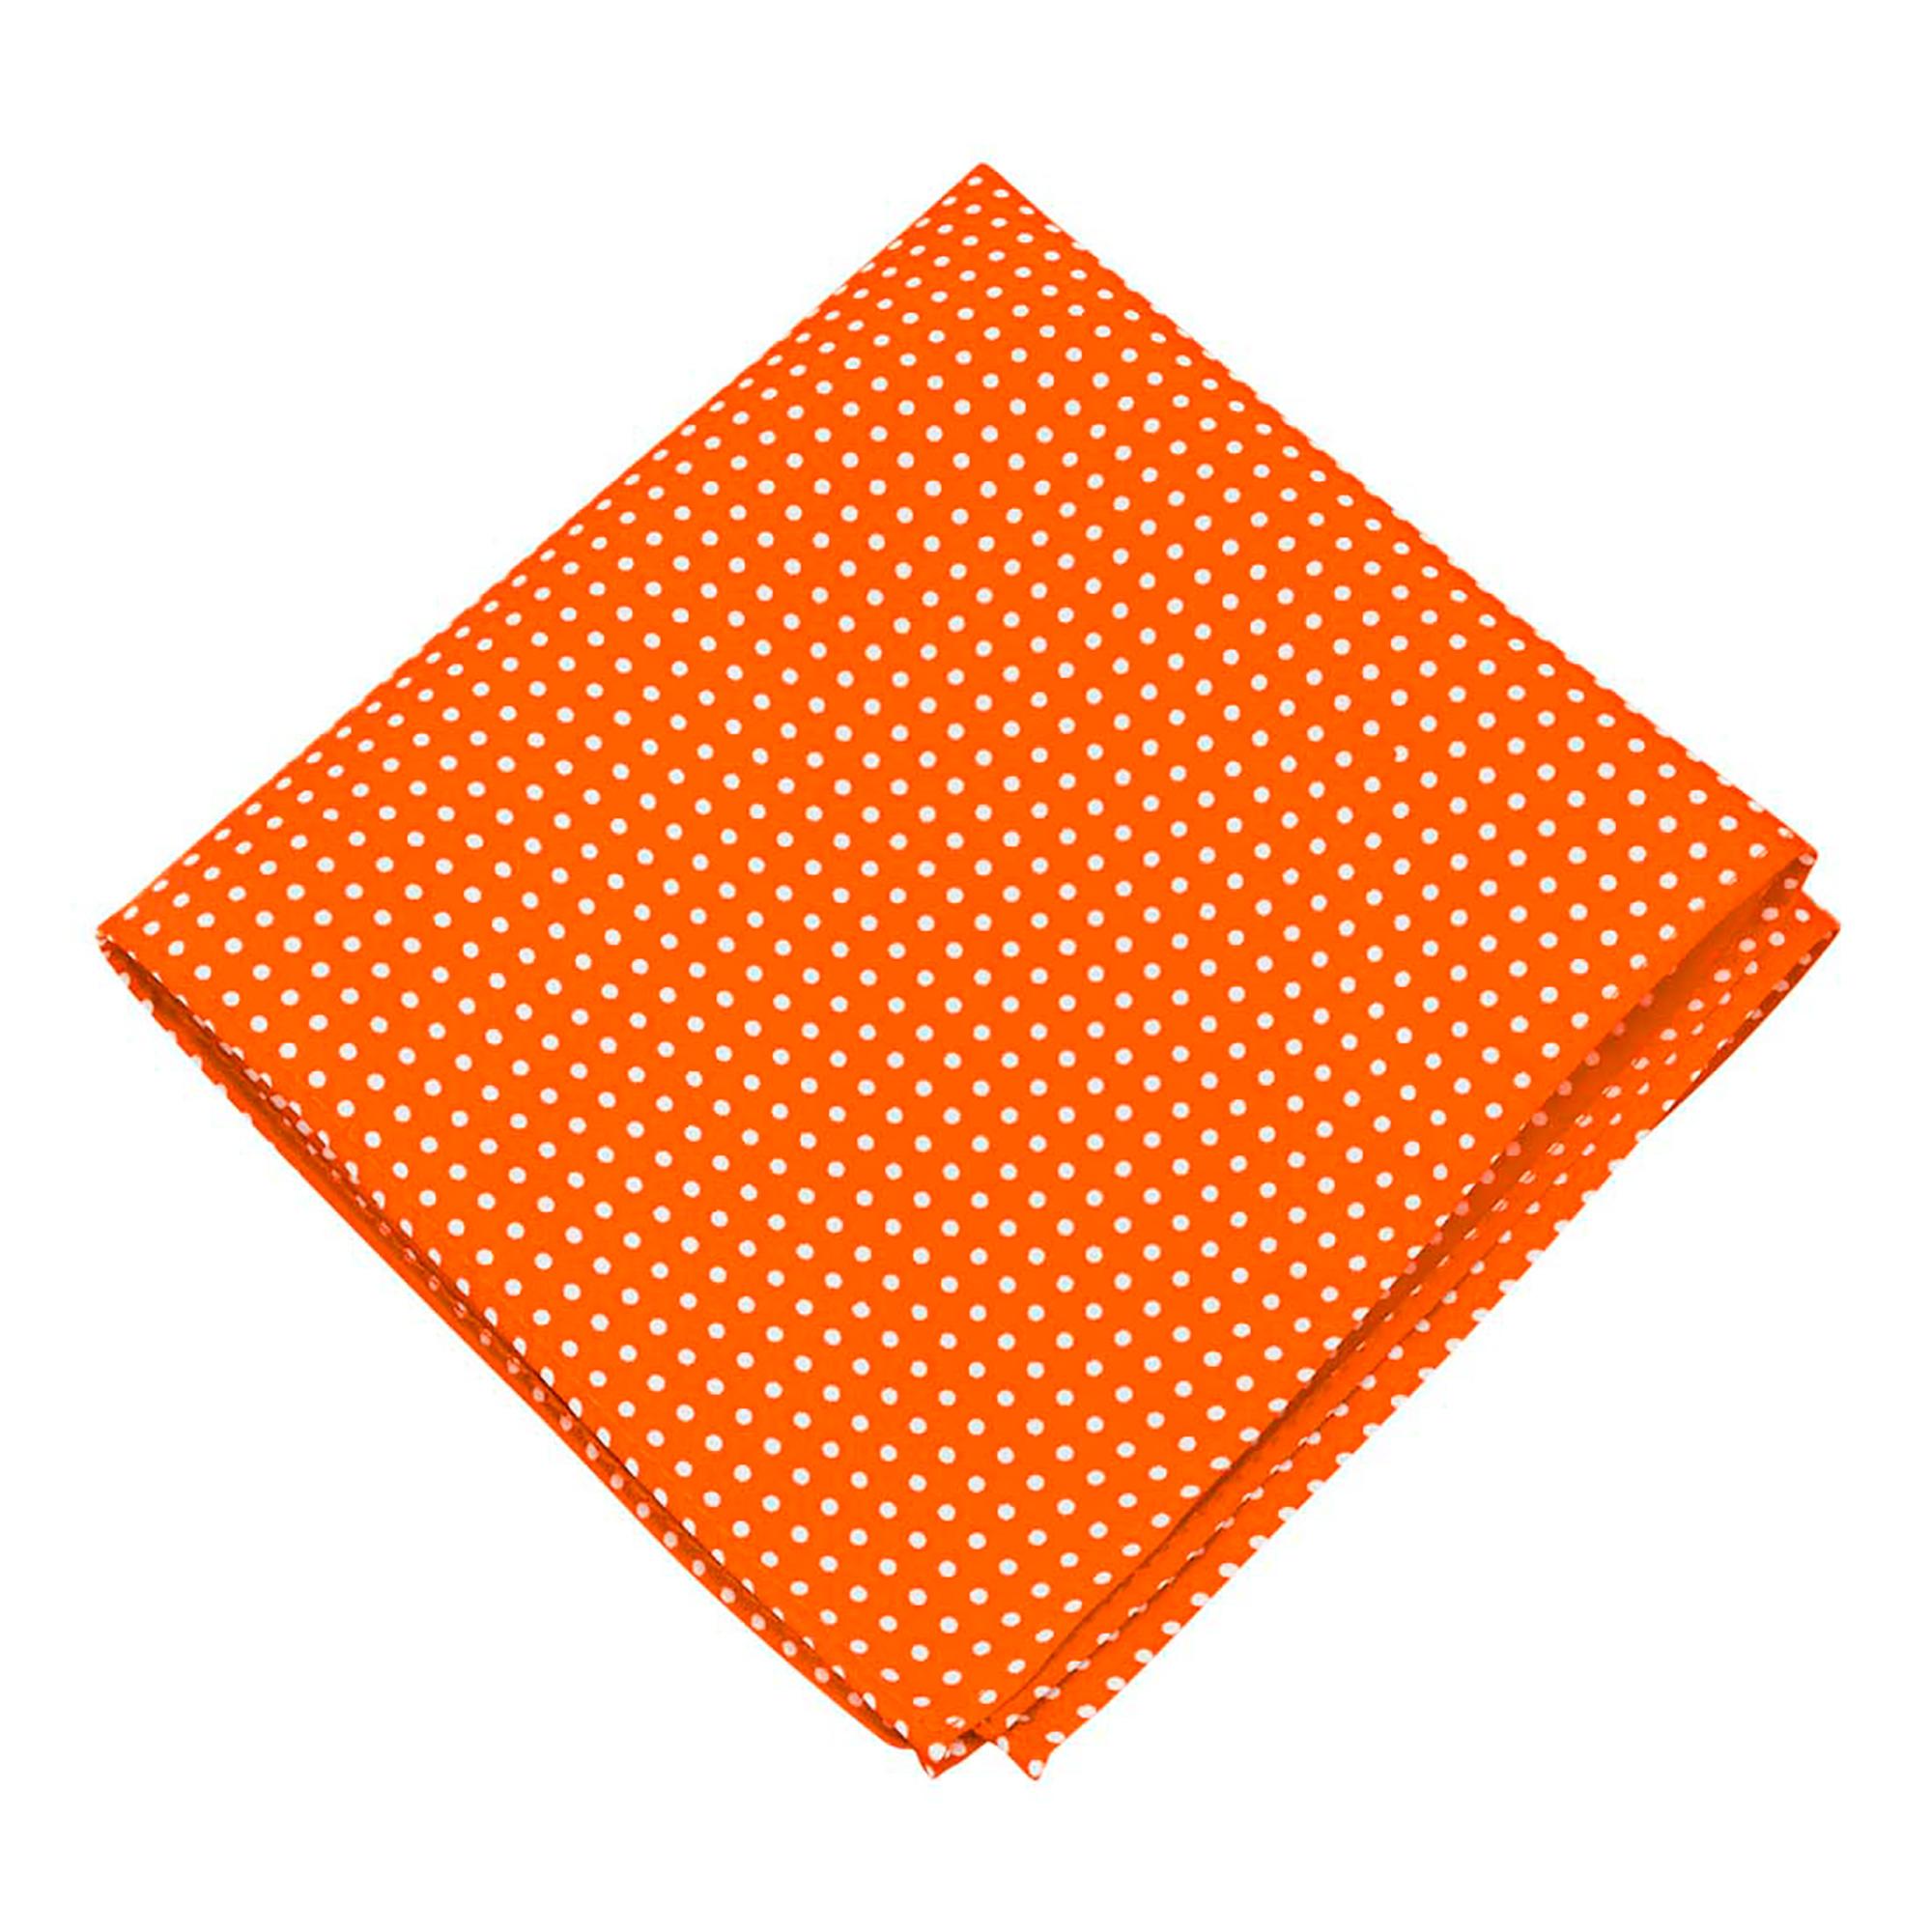 Jacob-Alexander-Matching-Polka-Dot-Suspenders-Handkerchief-and-Bow-Tie thumbnail 94